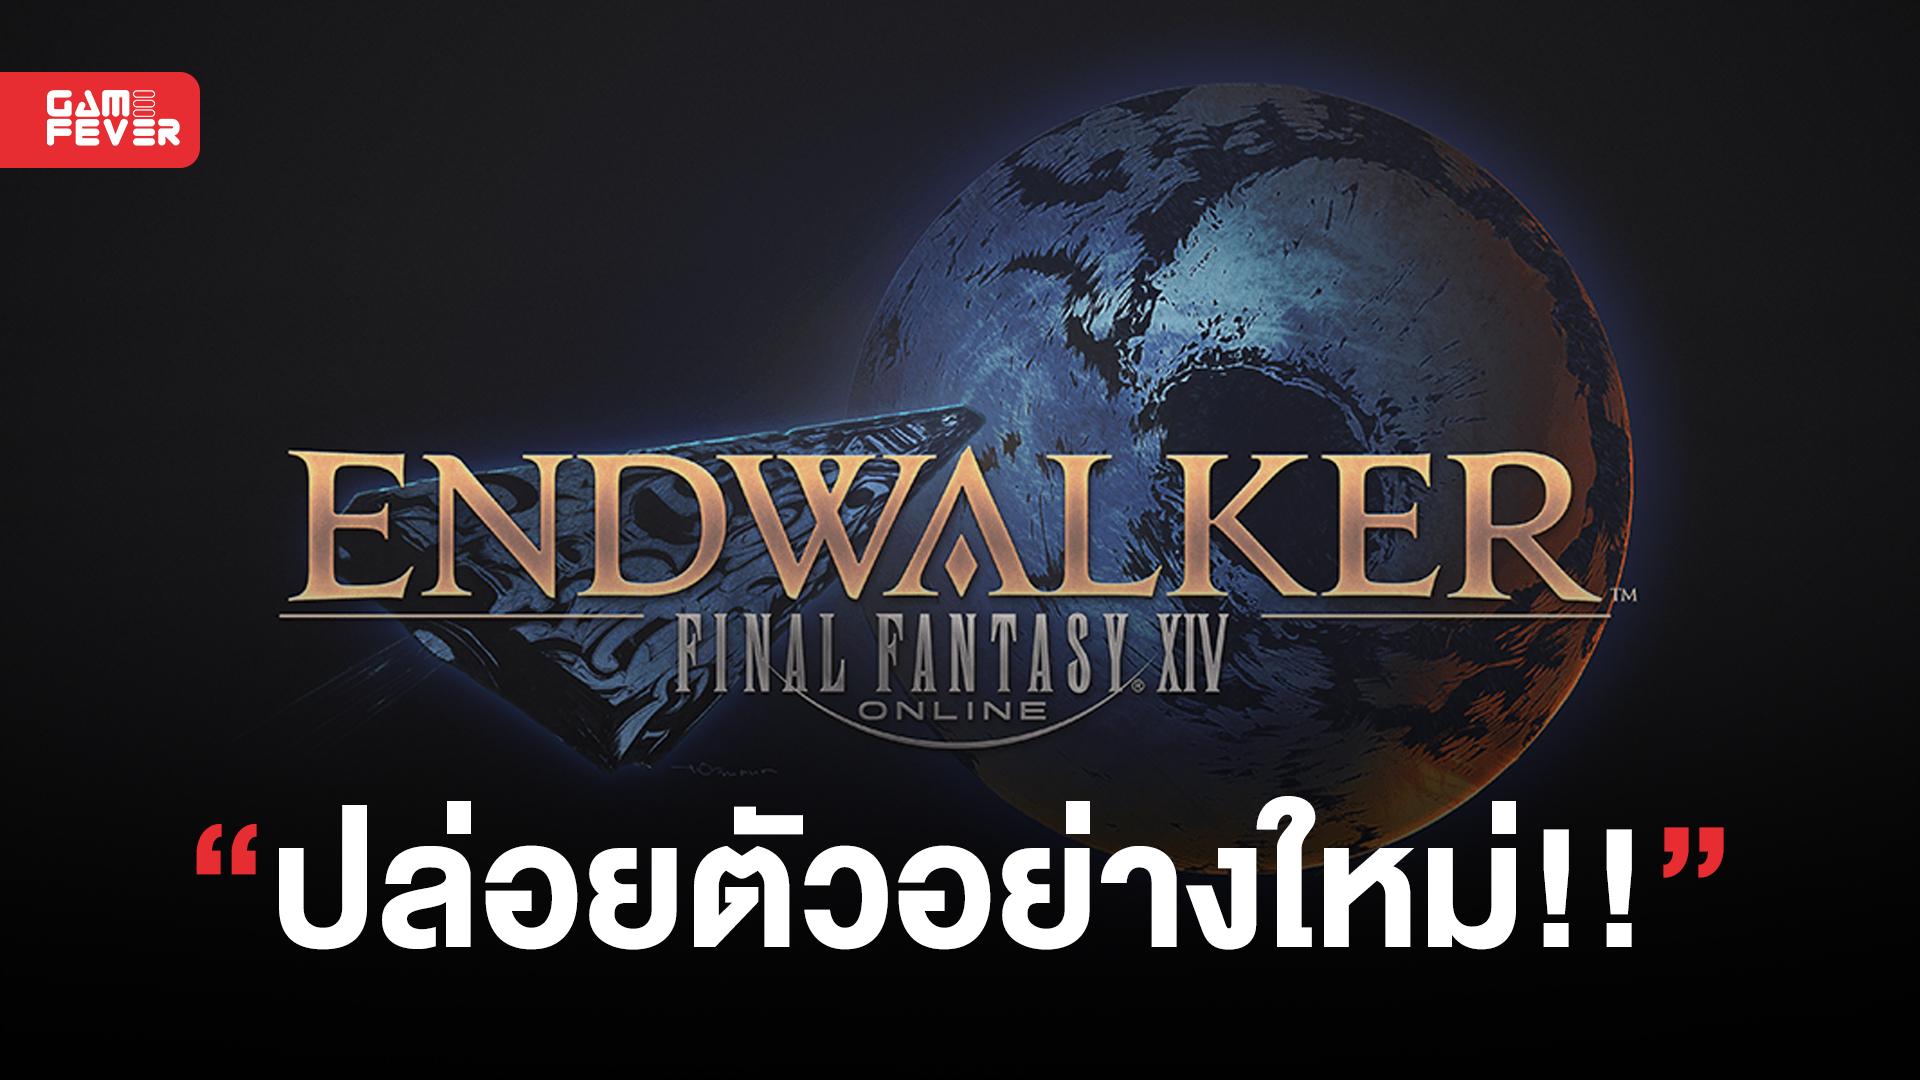 Final Fantasy 14: Endwalker ปล่อยตัวอย่างใหม่ เผยรายละเอียดการเปลี่ยนแปลงครั้งยิ่งใหญ่!!